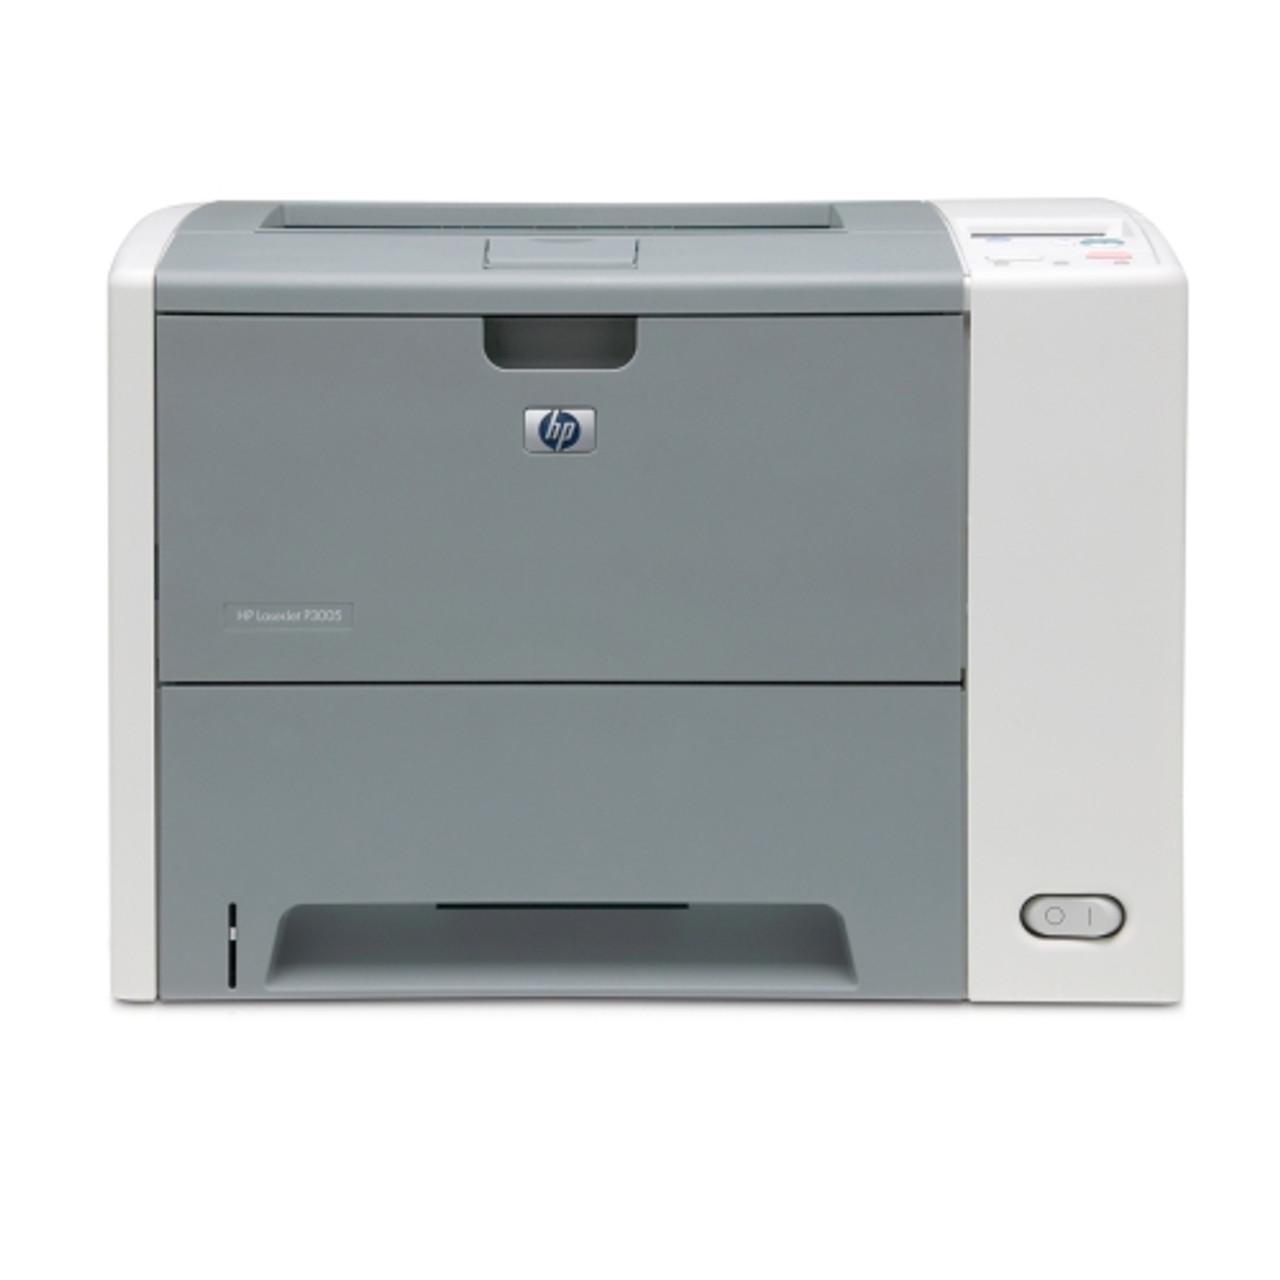 HP LaserJet P3005dn - Q7815A - HP Laser Printer for sale